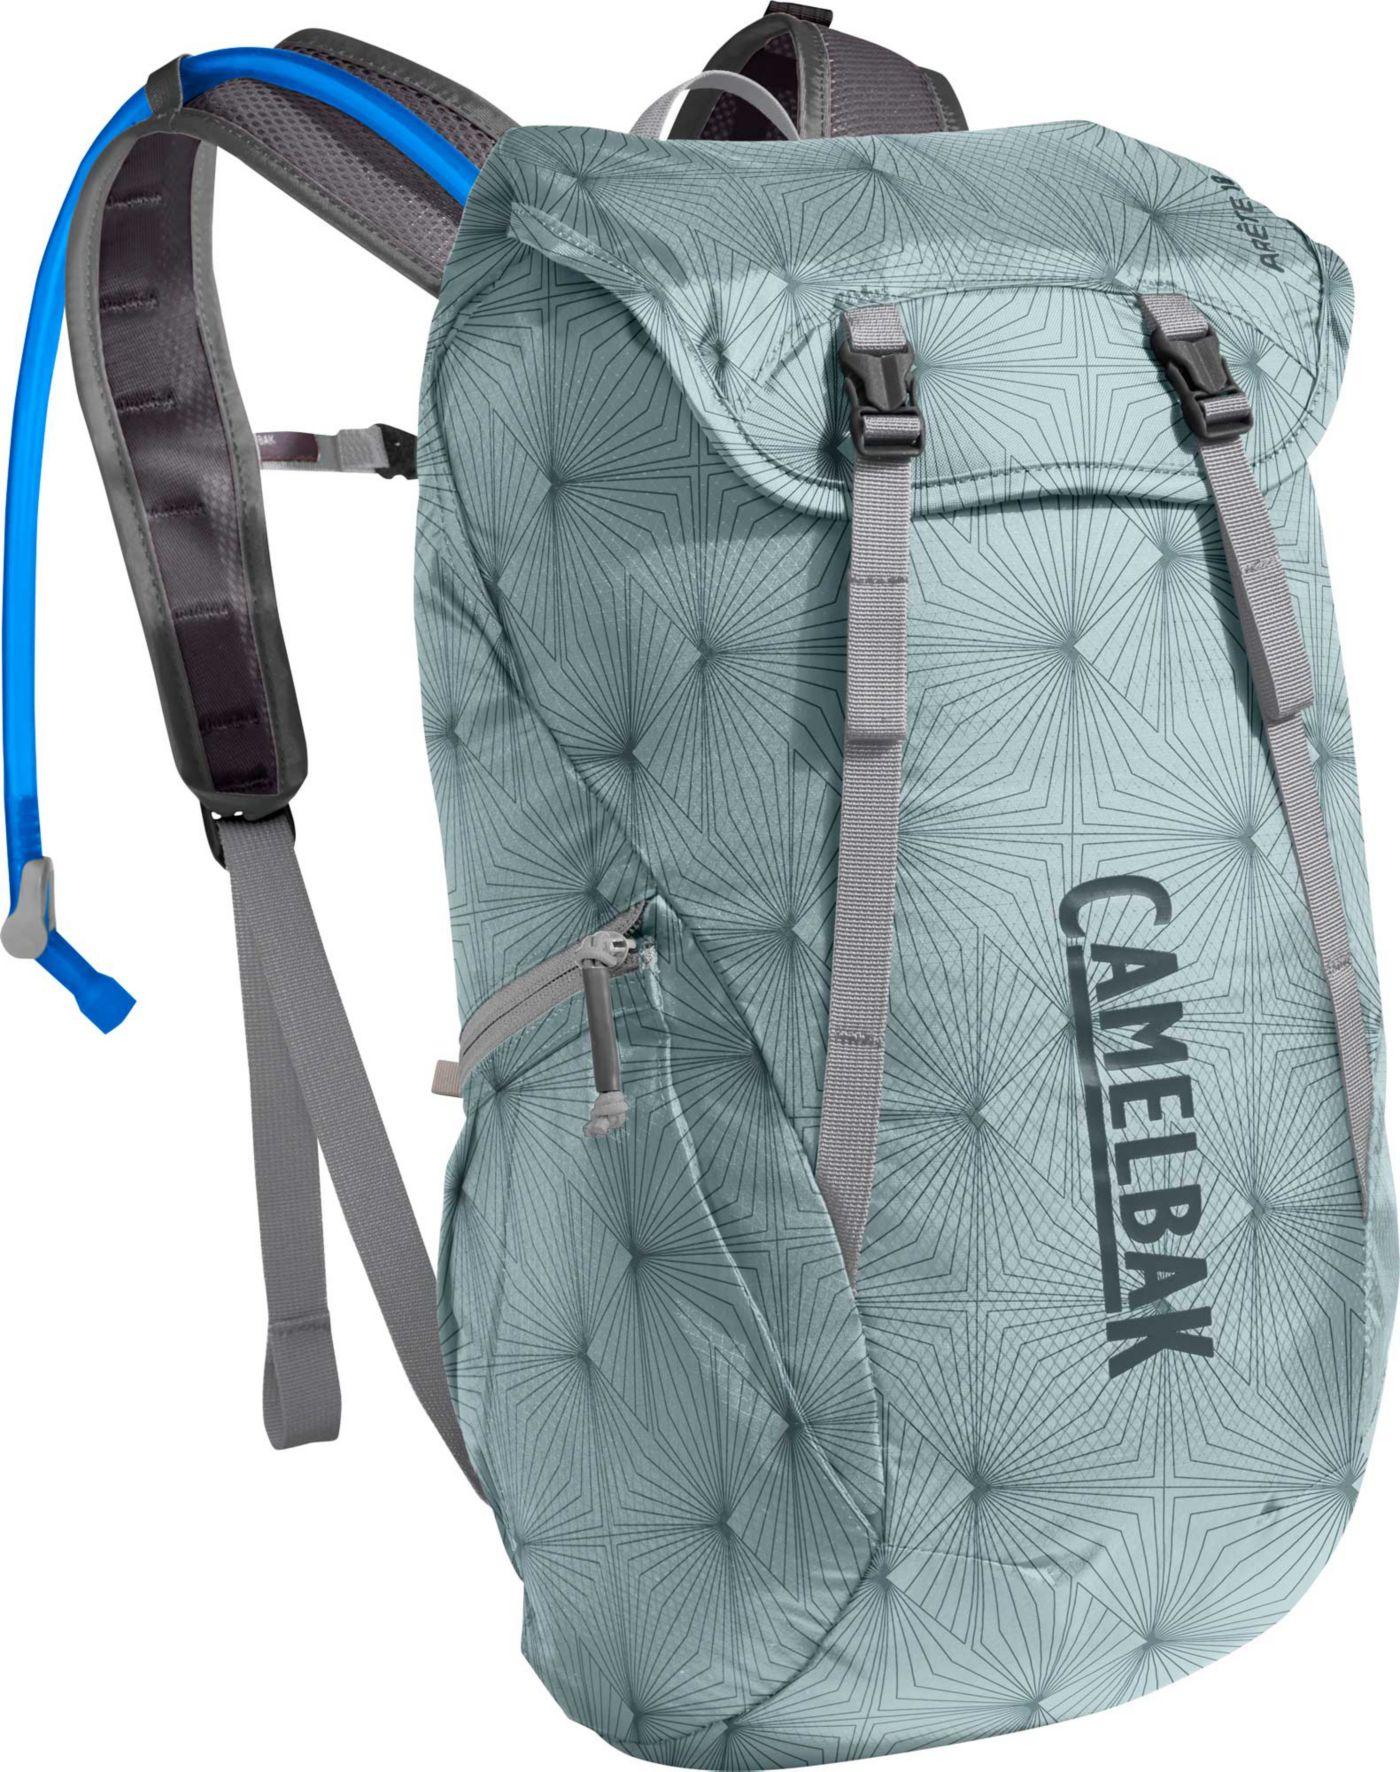 CamelBak Arete 18 50 oz. Hydration Pack